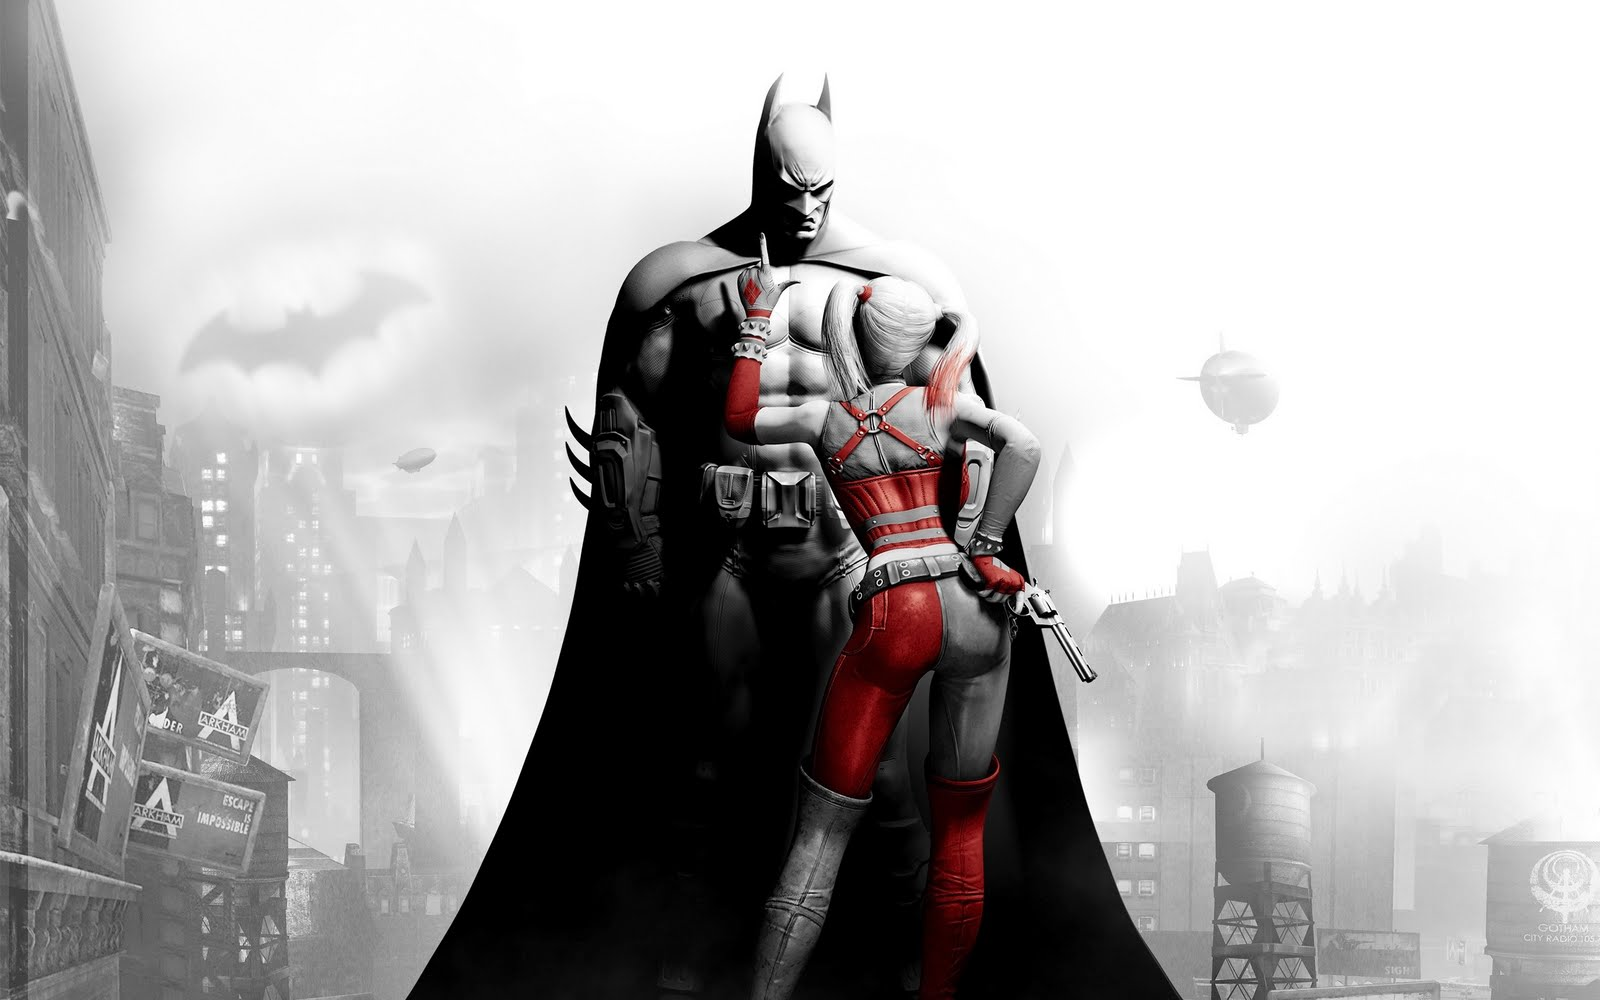 Cool Wallpapers Hd Batman